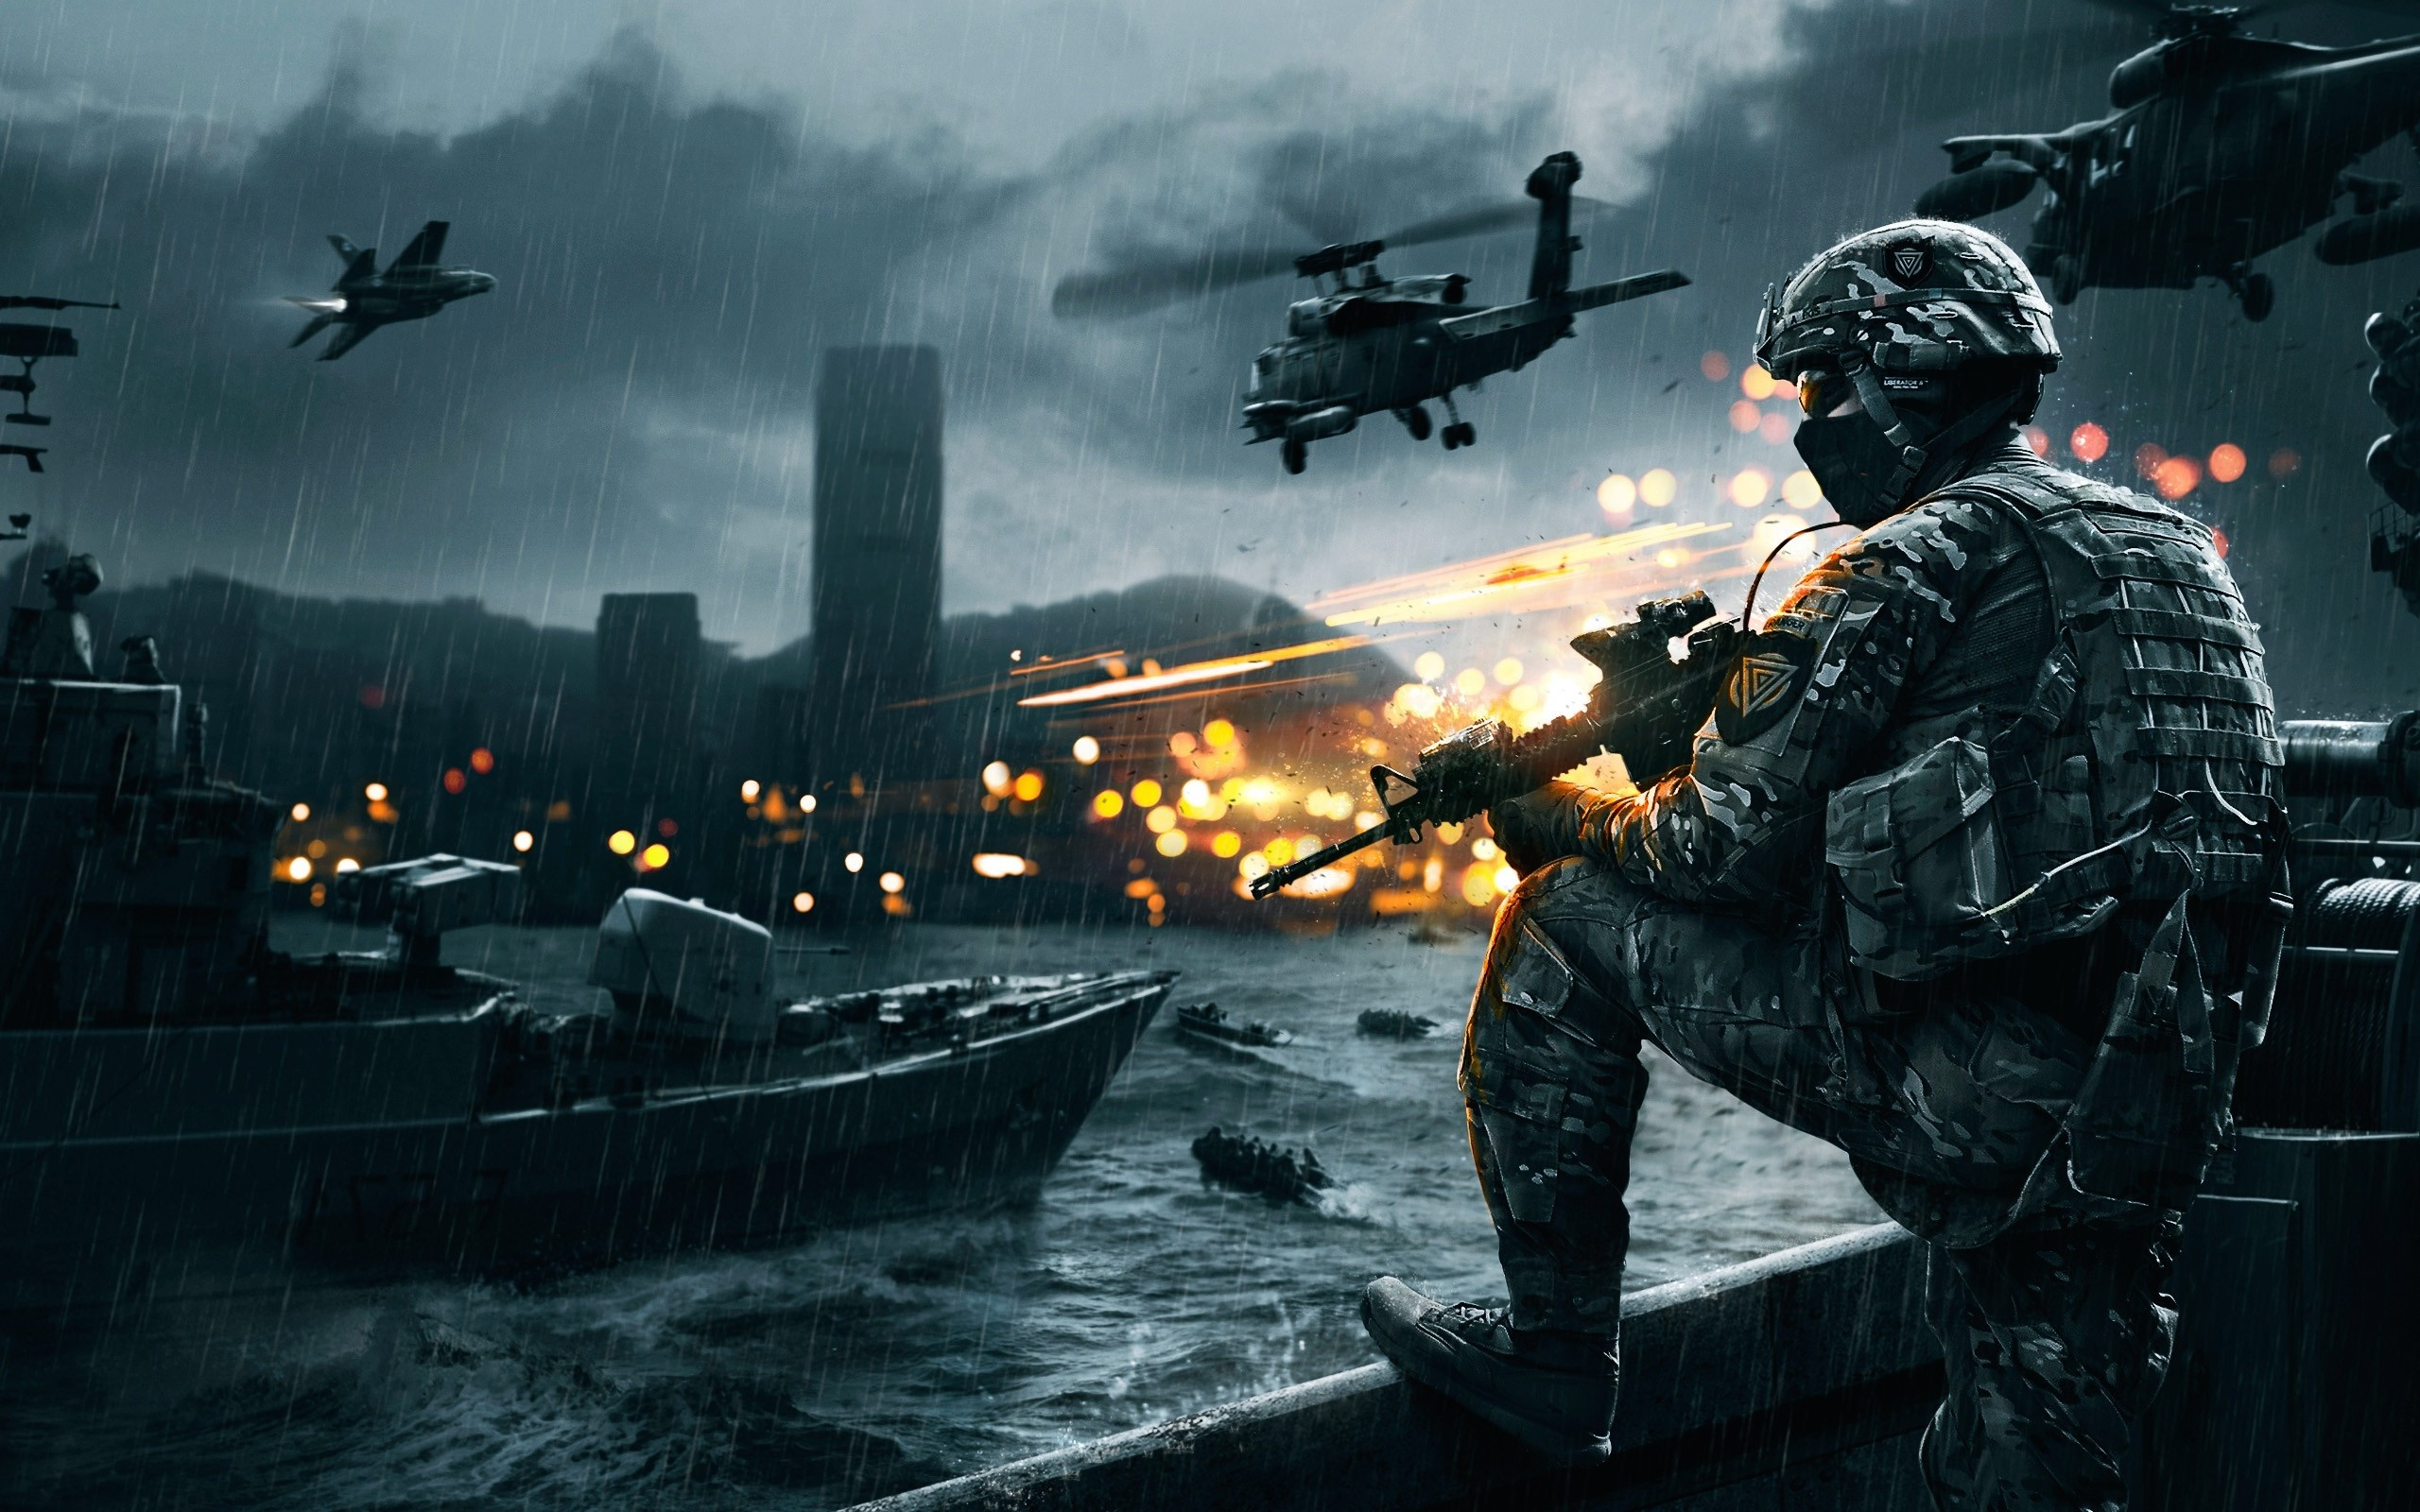 Fondos de pantalla Battlefield 4 Siege of Shanghai